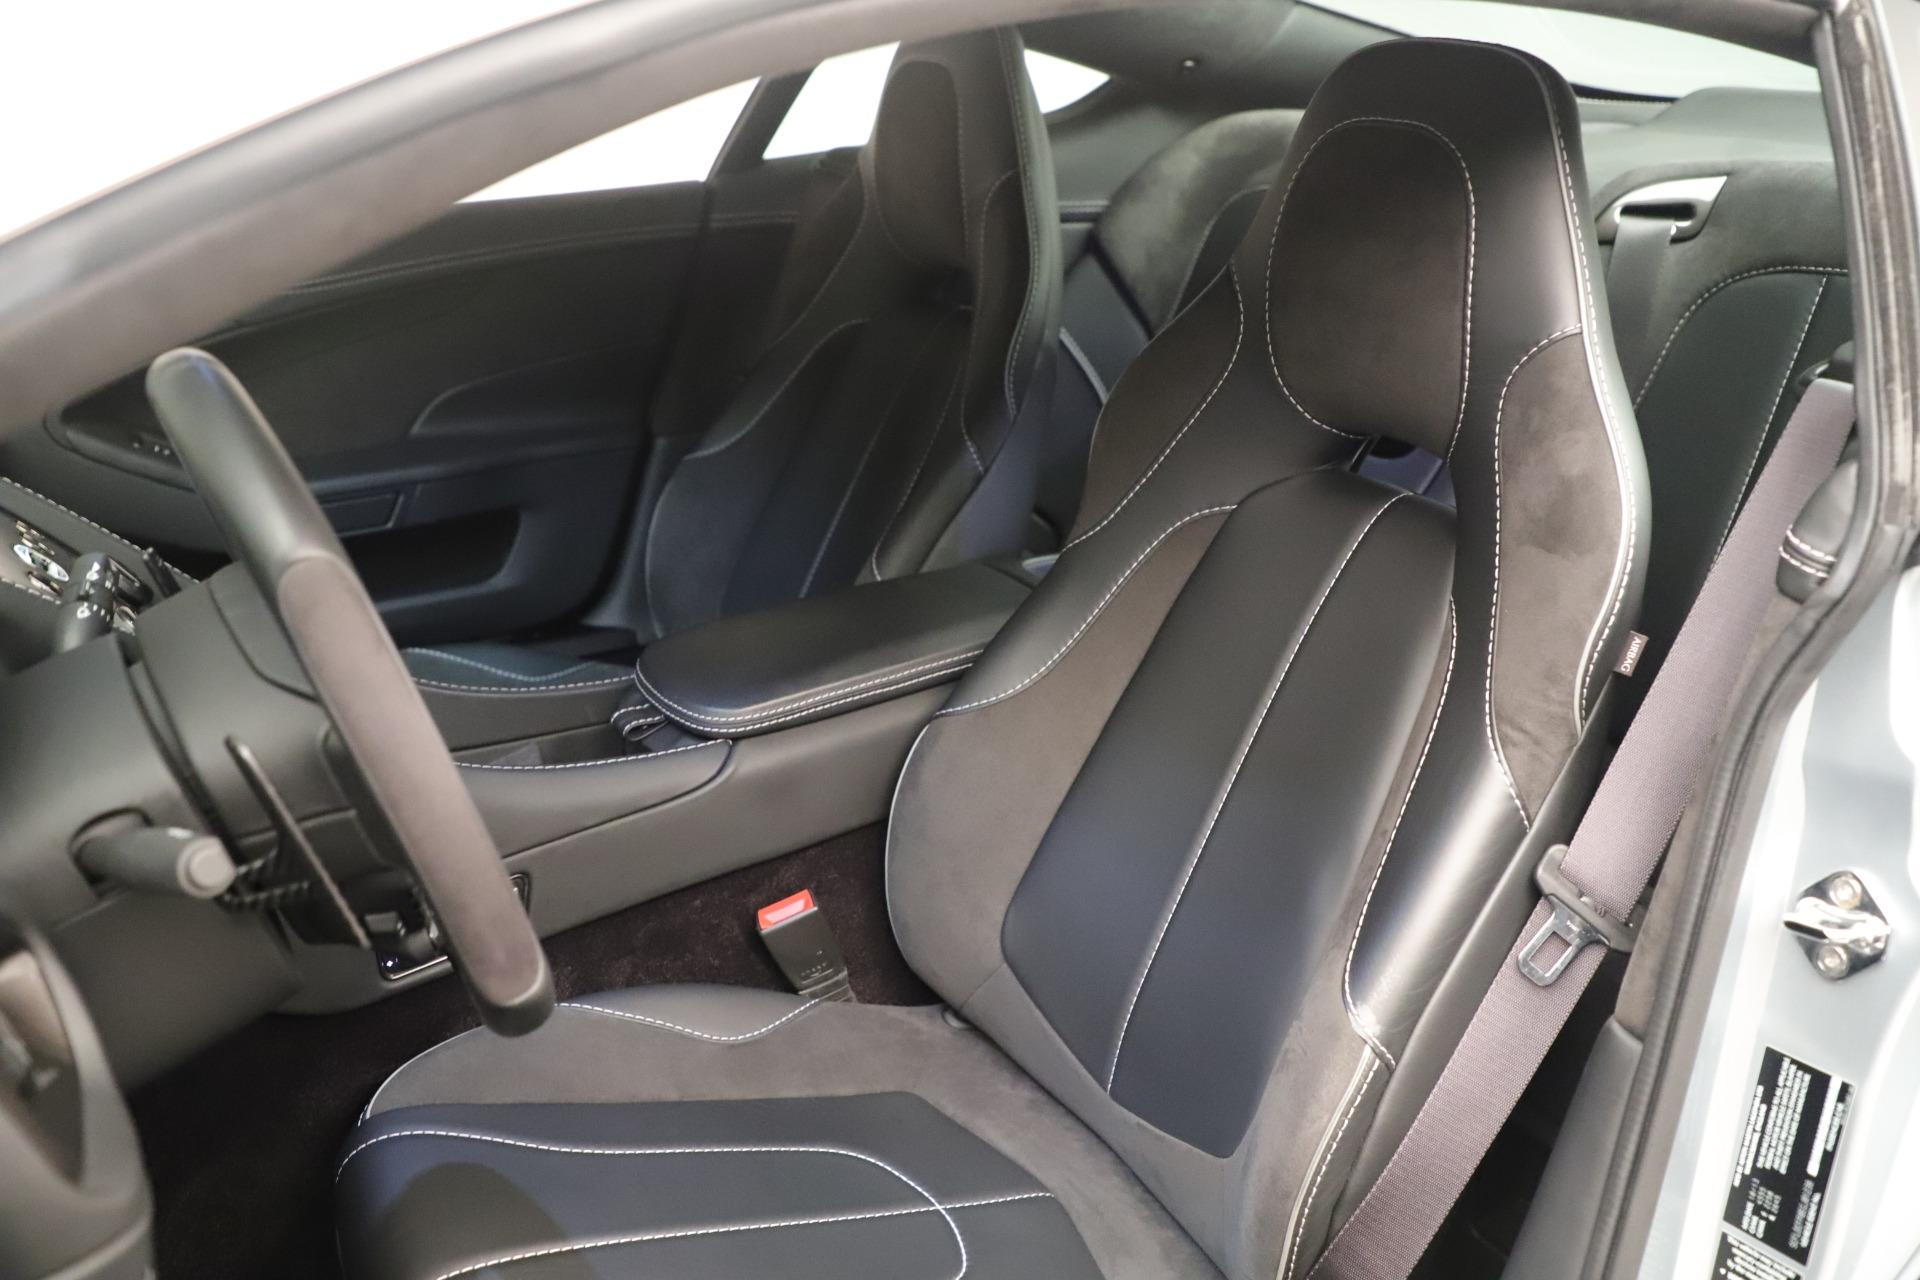 Used 2014 Aston Martin Vanquish  For Sale In Westport, CT 3445_p14